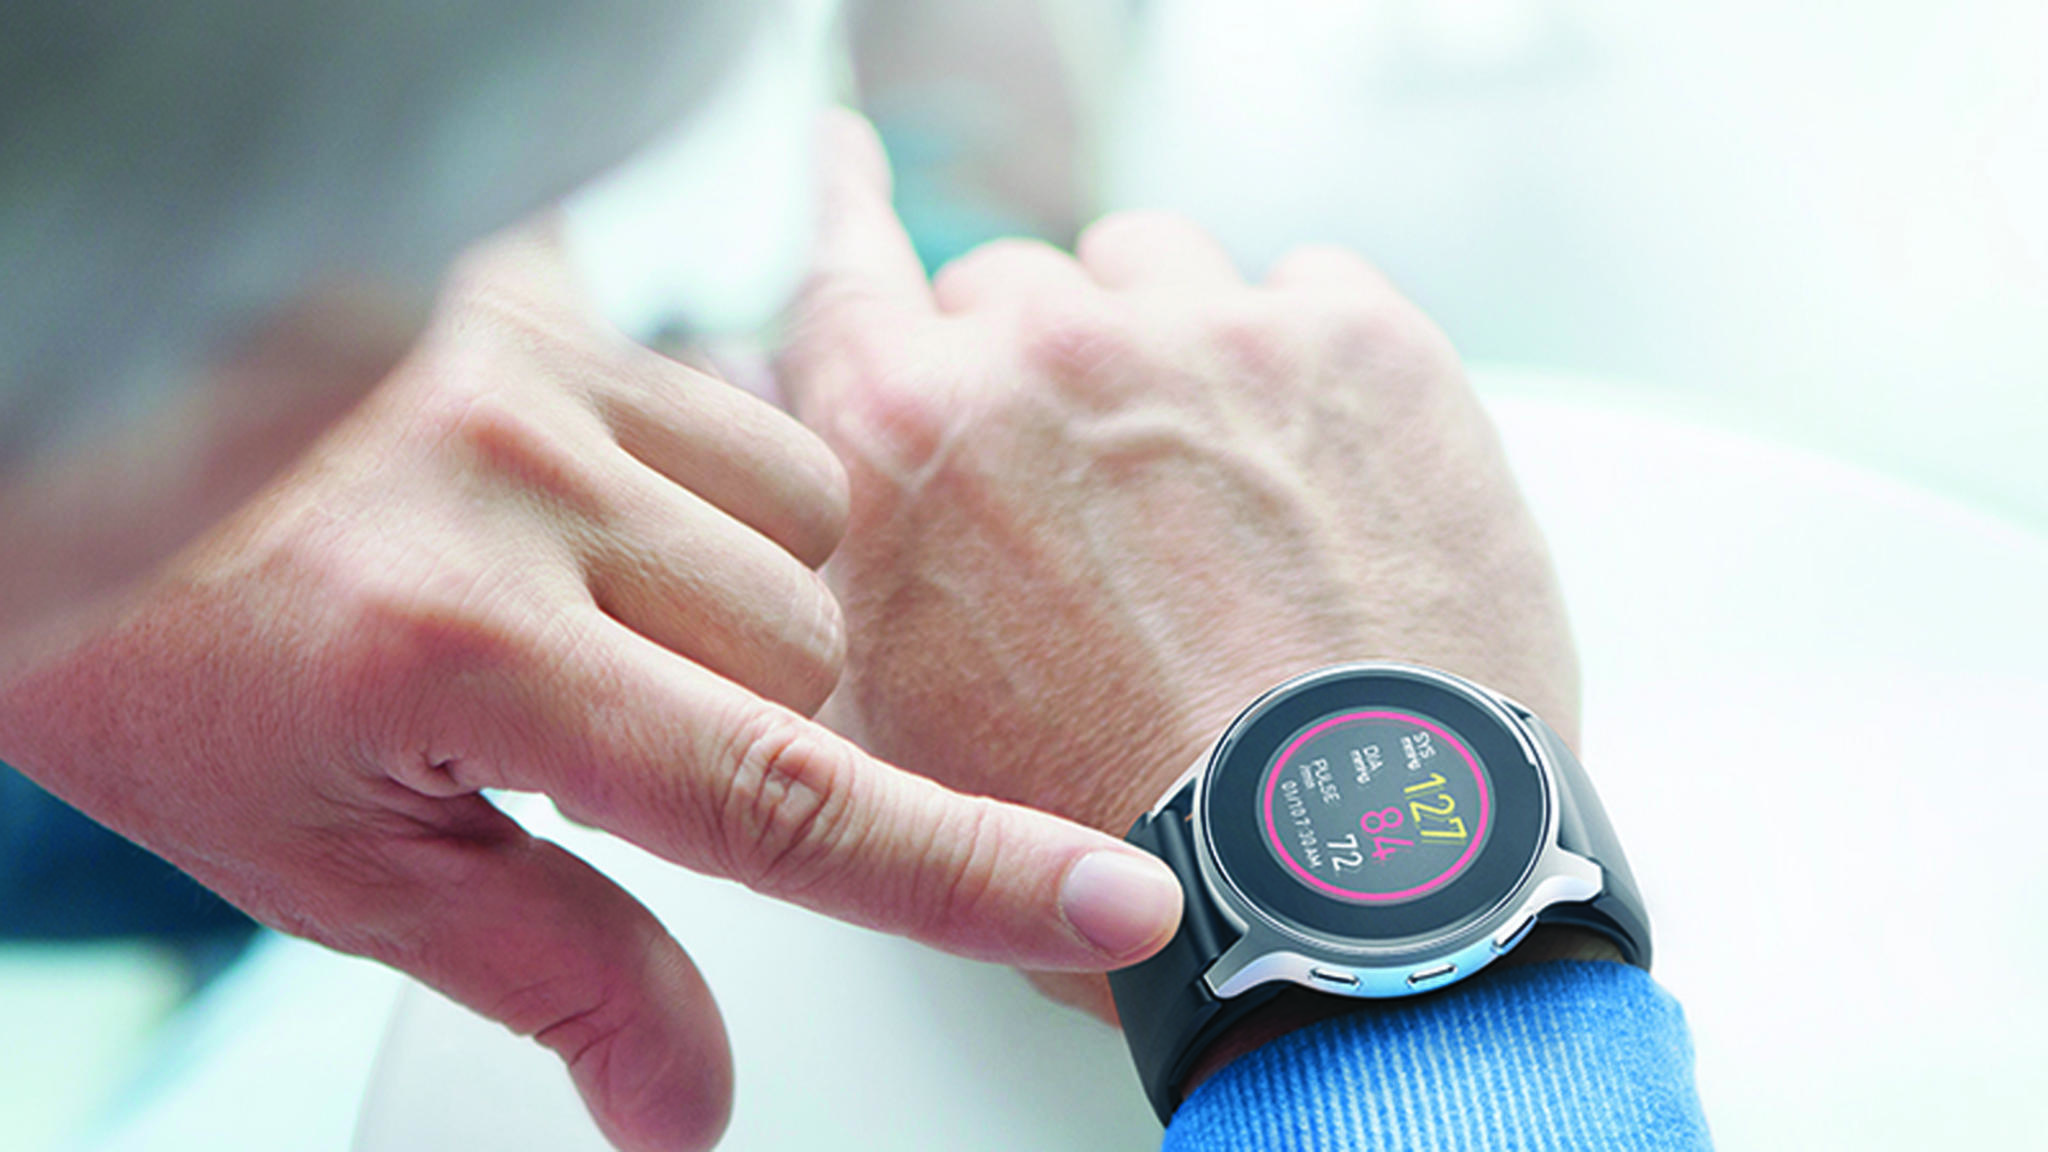 Omrons neuer HeartGuide hat jetzt den Segen der FDA.